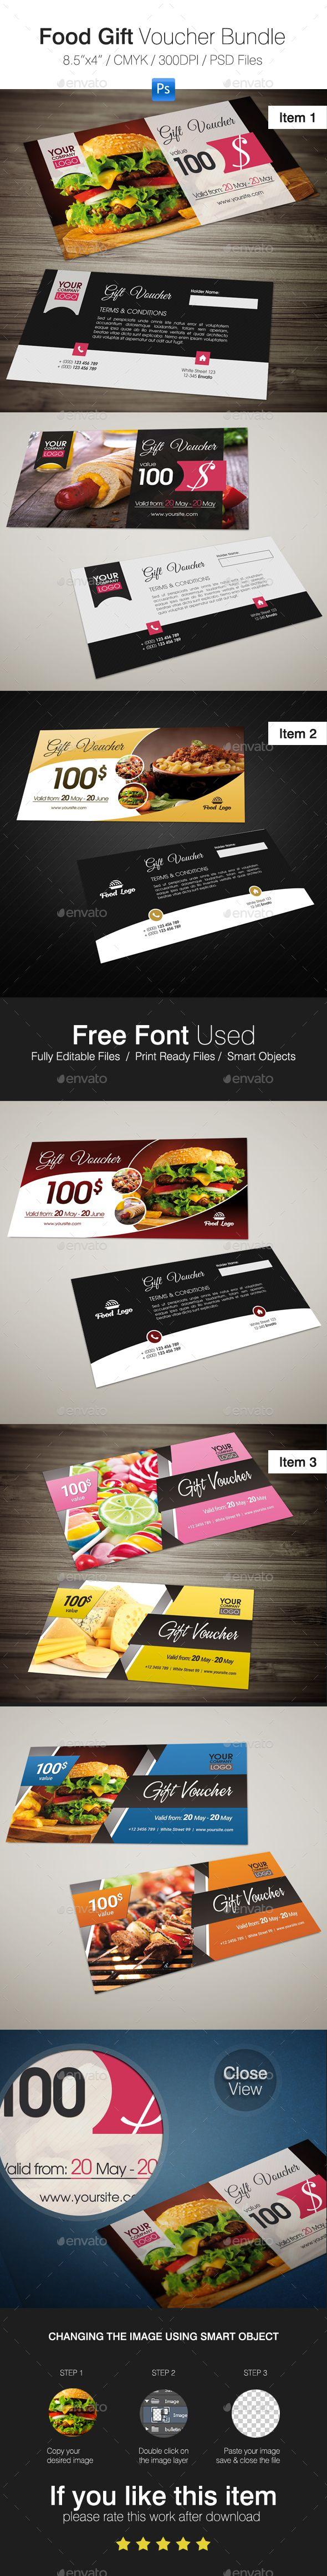 Best 25 Gift card template ideas on Pinterest